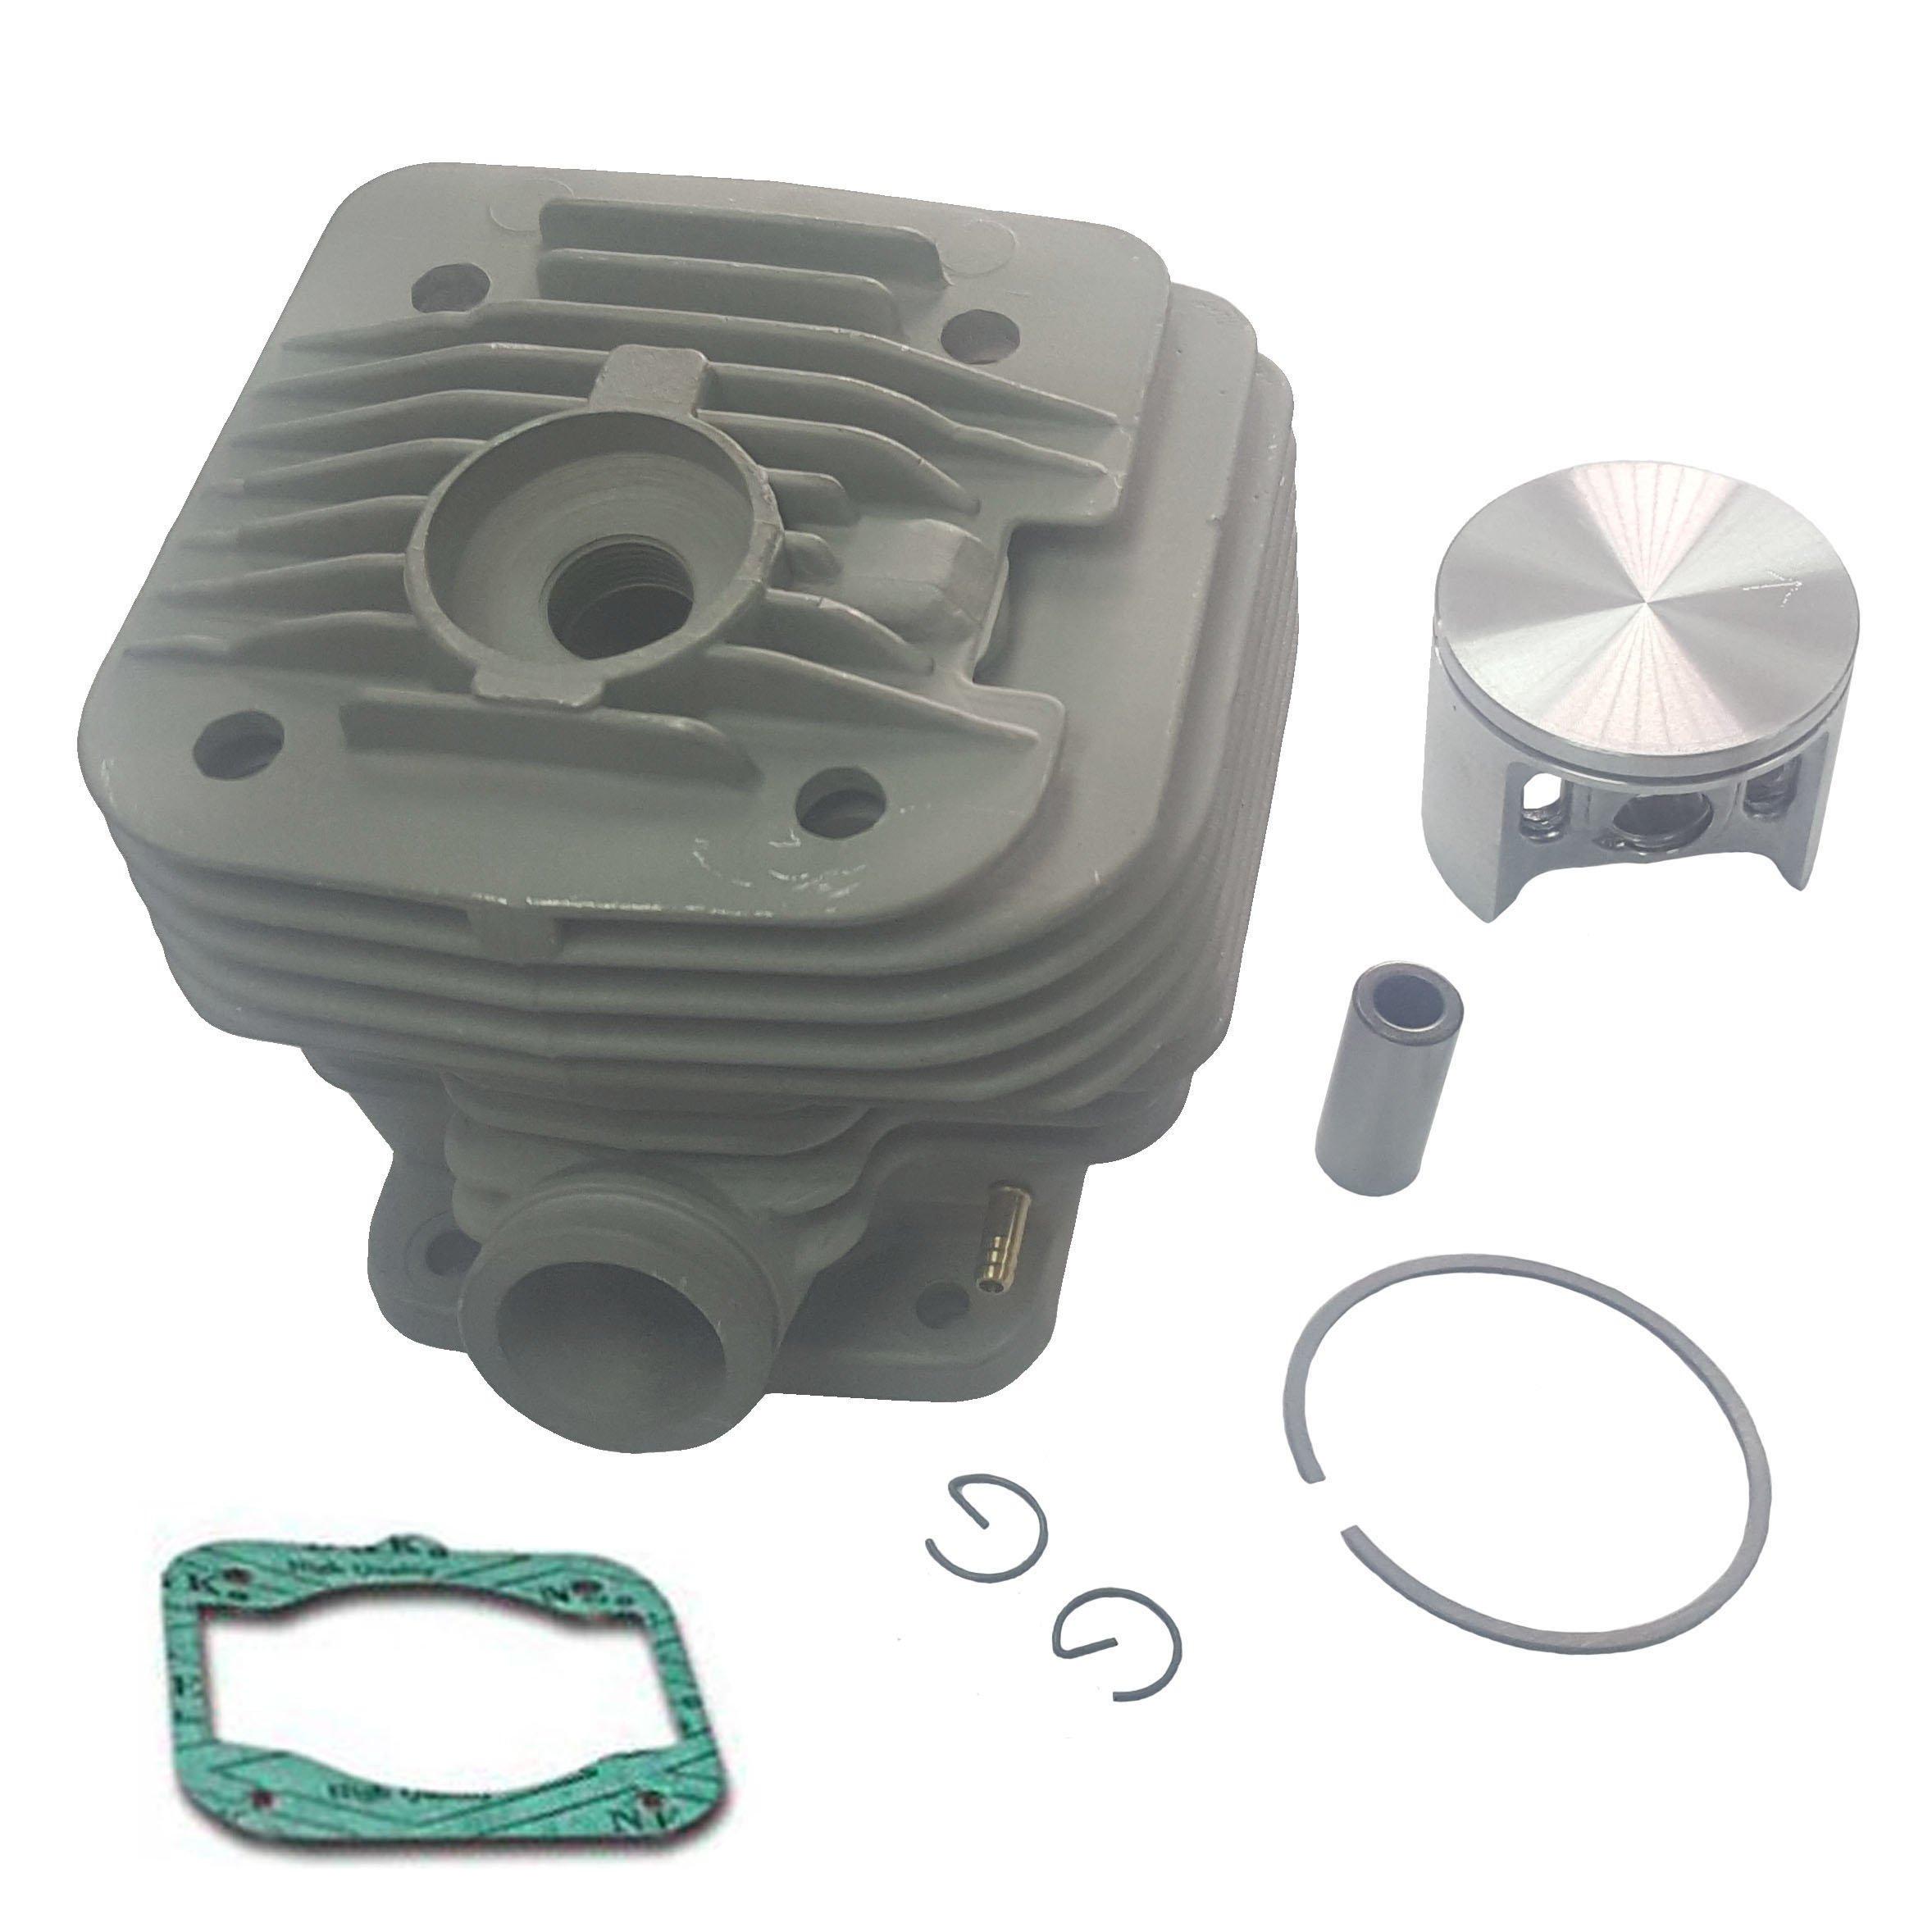 Makita Cylinder Piston Kit + Gasket Makita DPC7300, DPC7301, DPC7310, DPC7311 , Dolmar 7300, 7311 Concrete Cut off Saw Nikasil